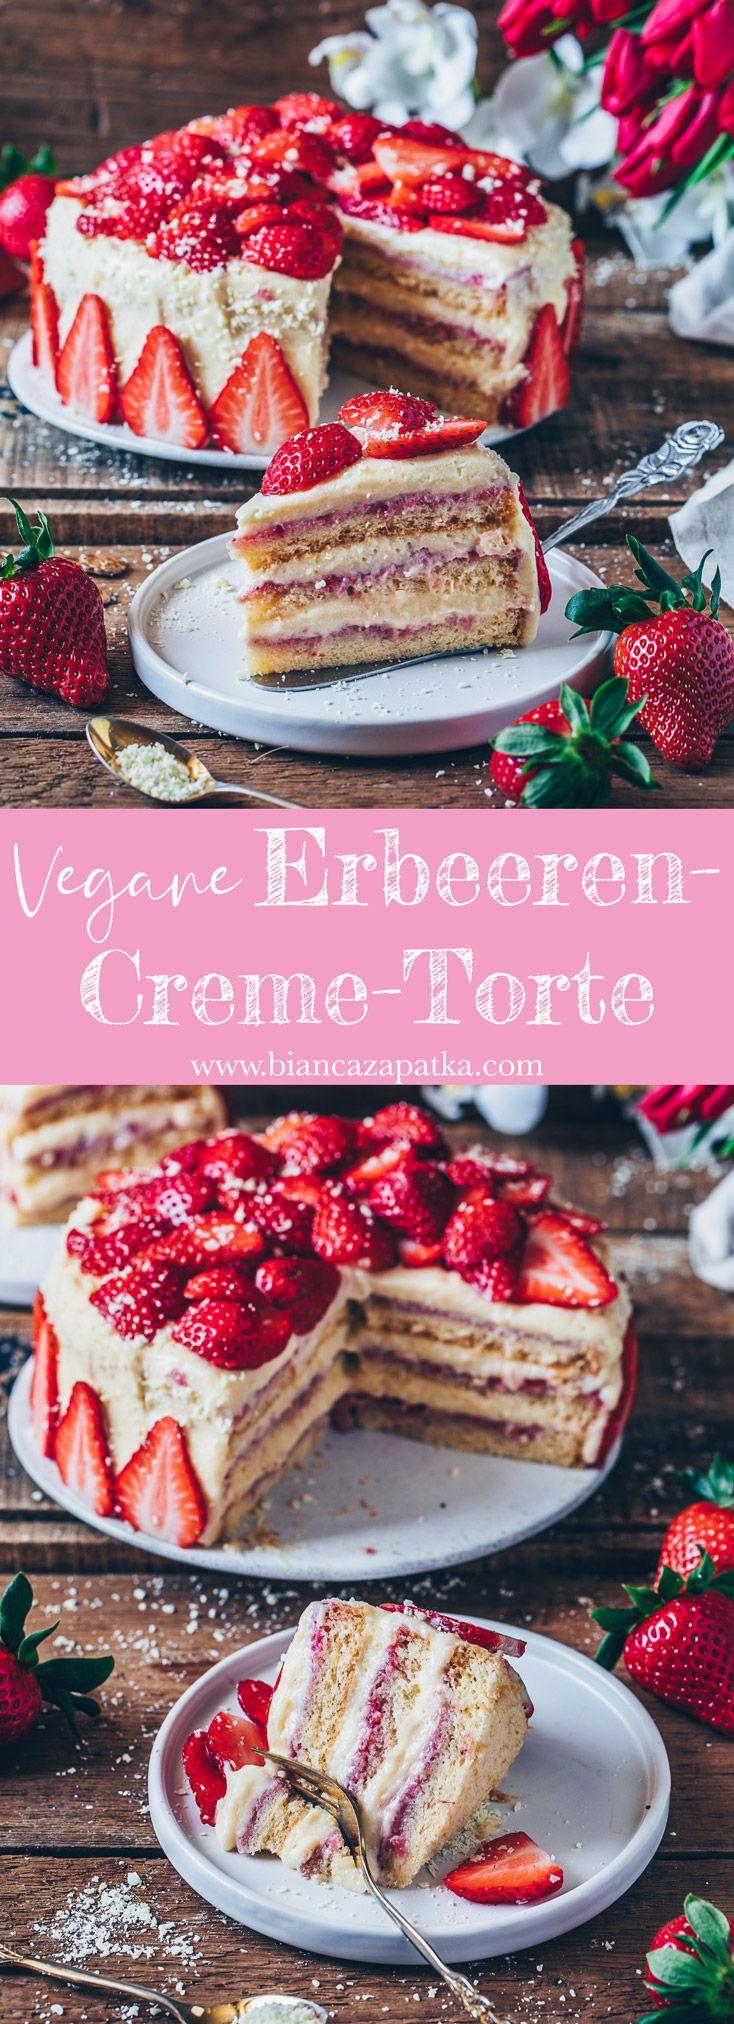 Erdbeer-Creme-Torte (Vegan) - Bianca Zapatka | Rezepte #savourycake